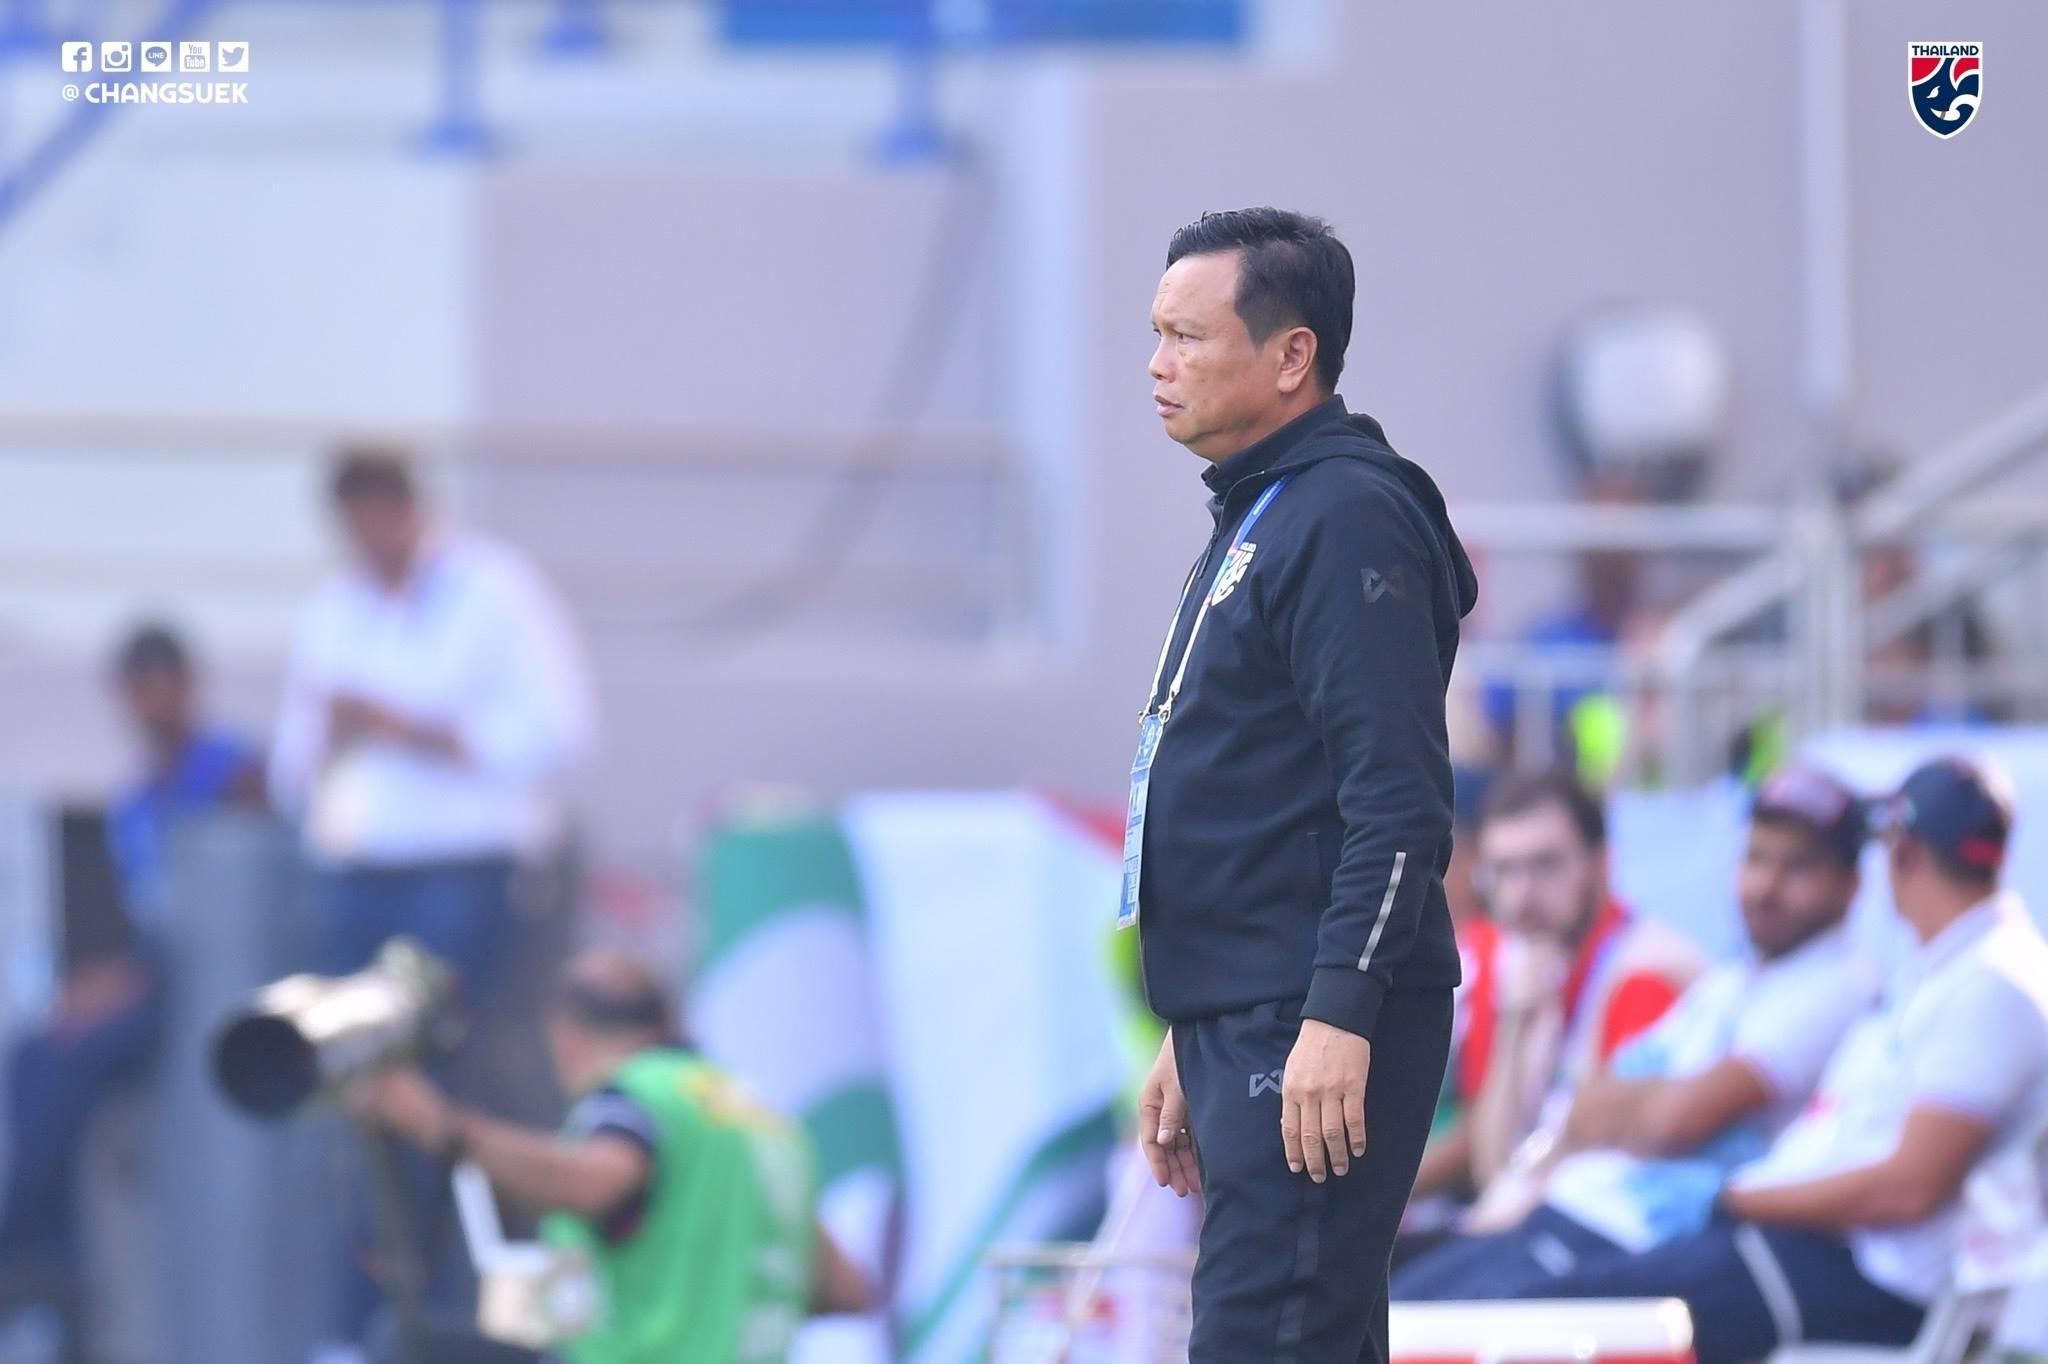 Fact หลังเกม : 5 ปัจจัยพา ทีมชาติไทย คืนฟอร์มเฉือน บาห์เรน ในเอเชียน คัพ 2019